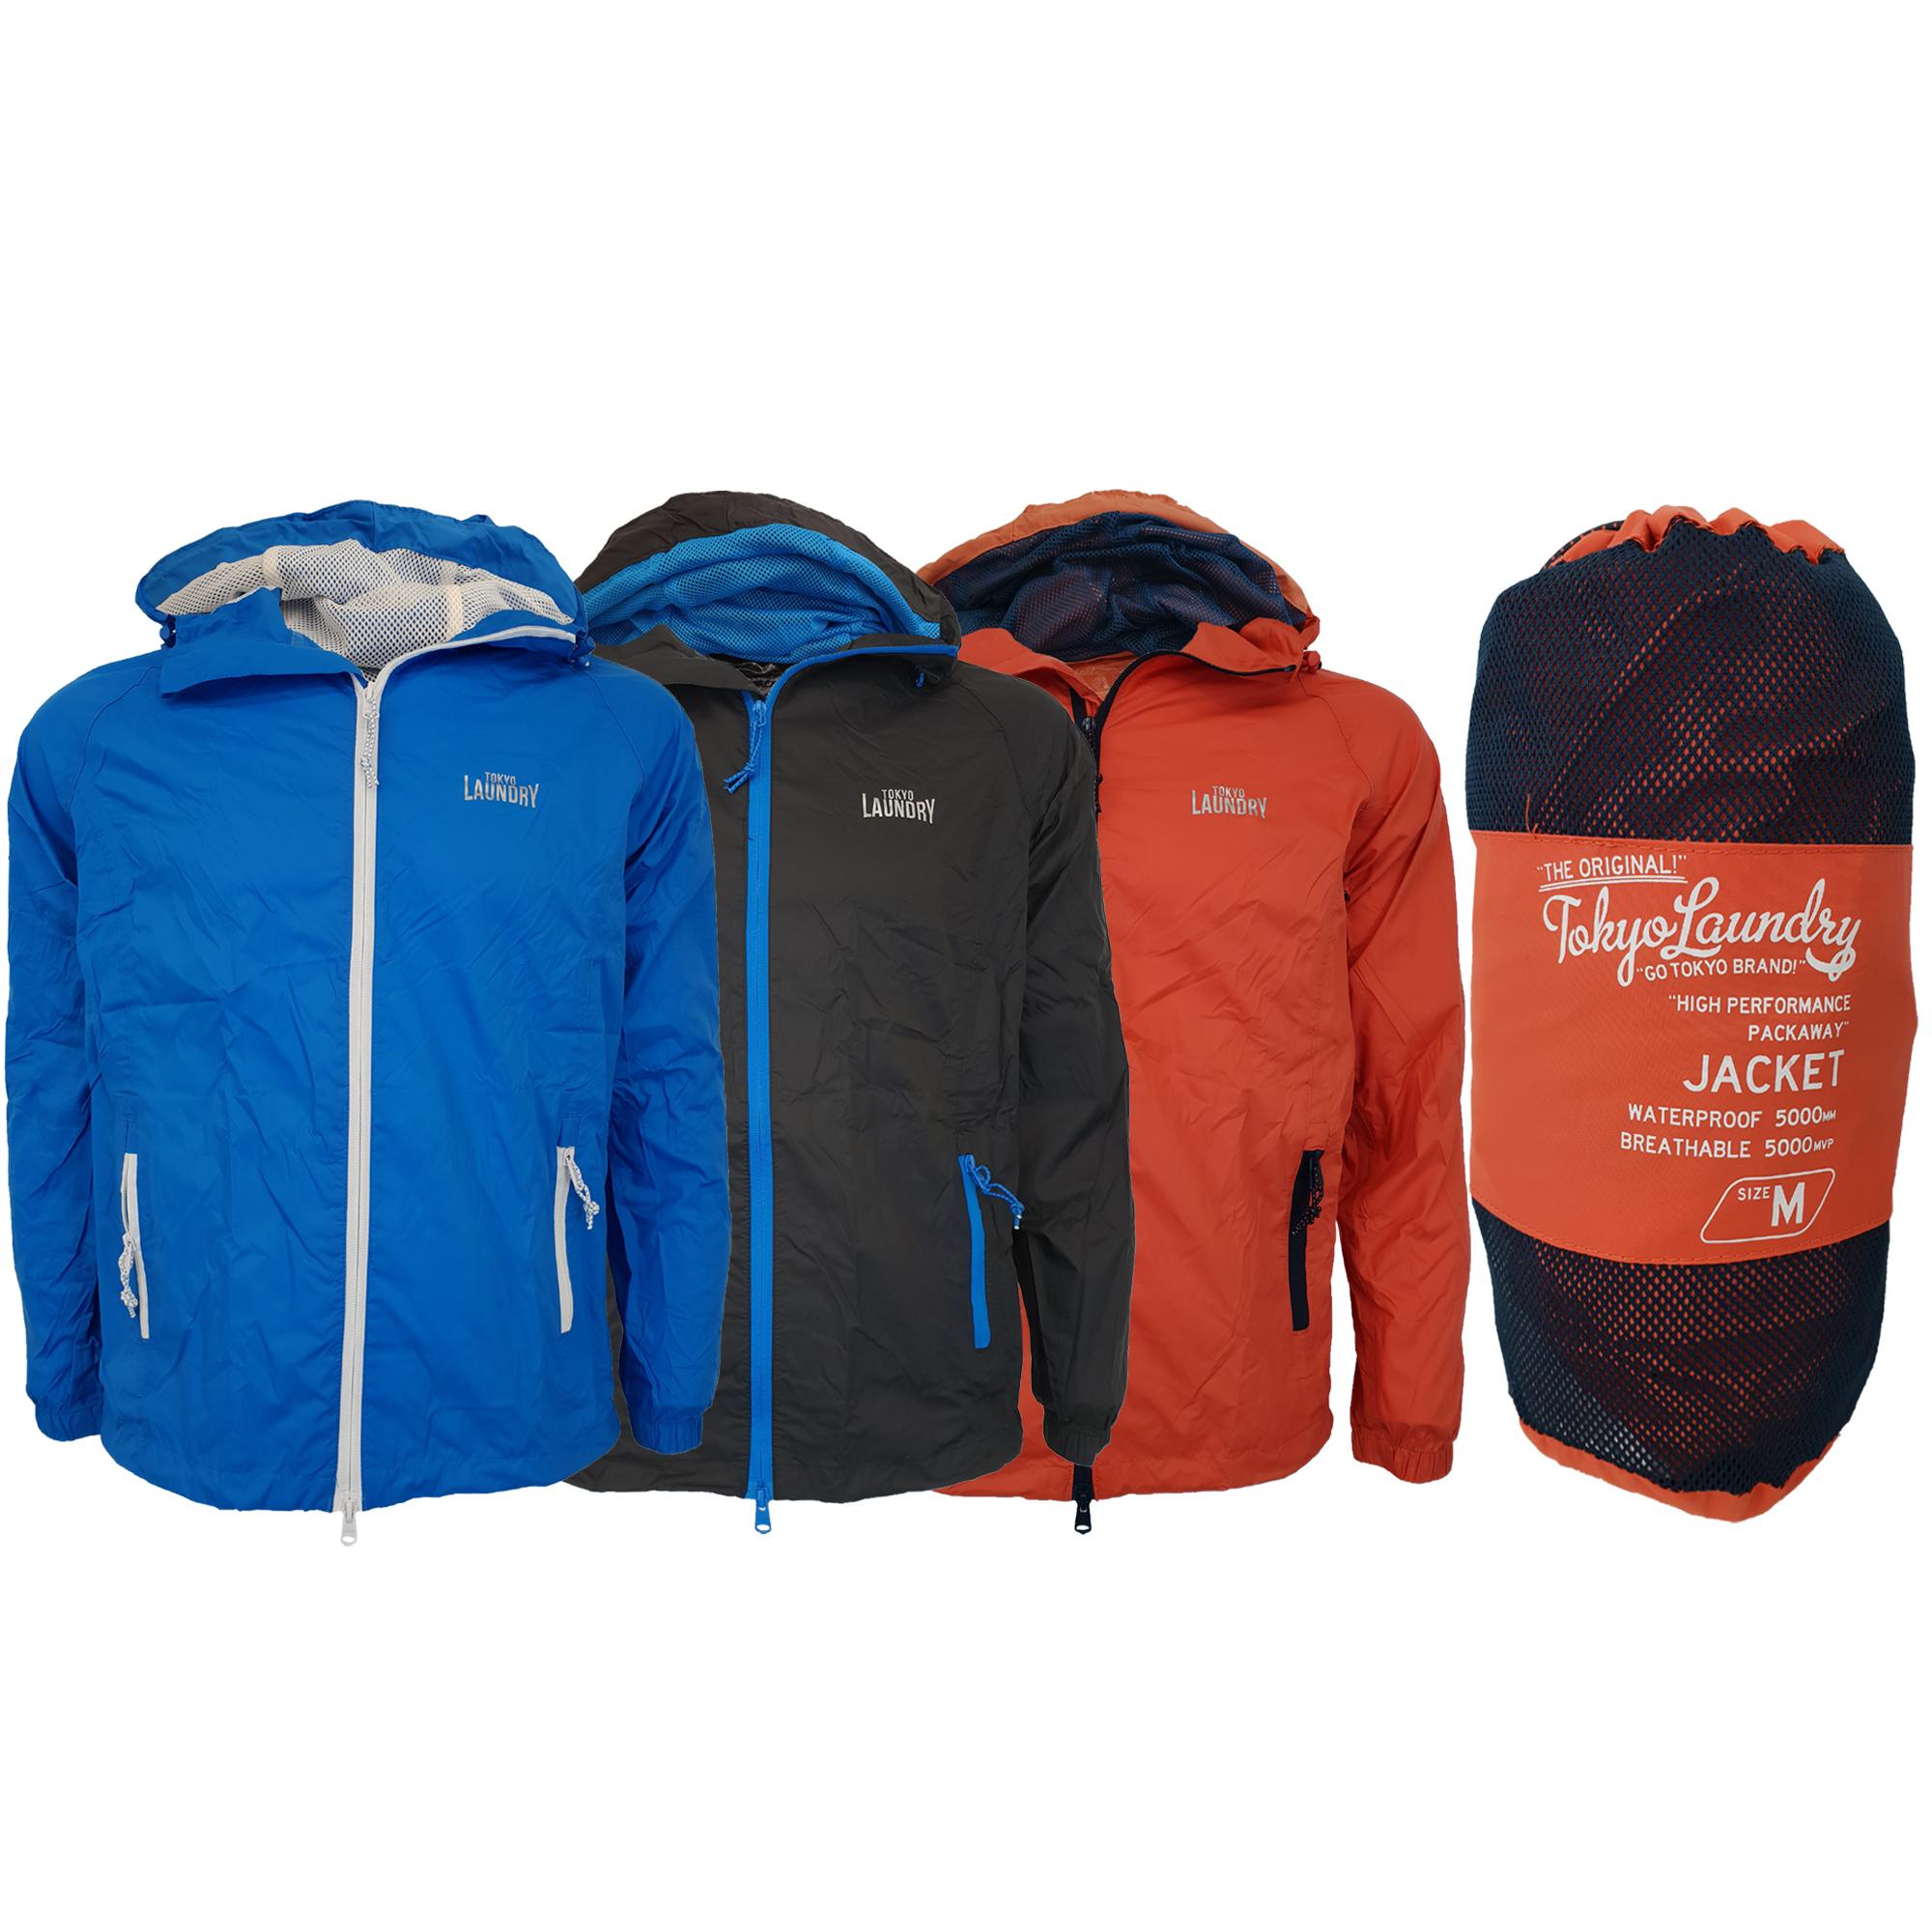 Mens-Kagool-Breathable-Hooded-Jacket-Tokyo-Laundry-Waterproof-Coat-Windproof-New thumbnail 4